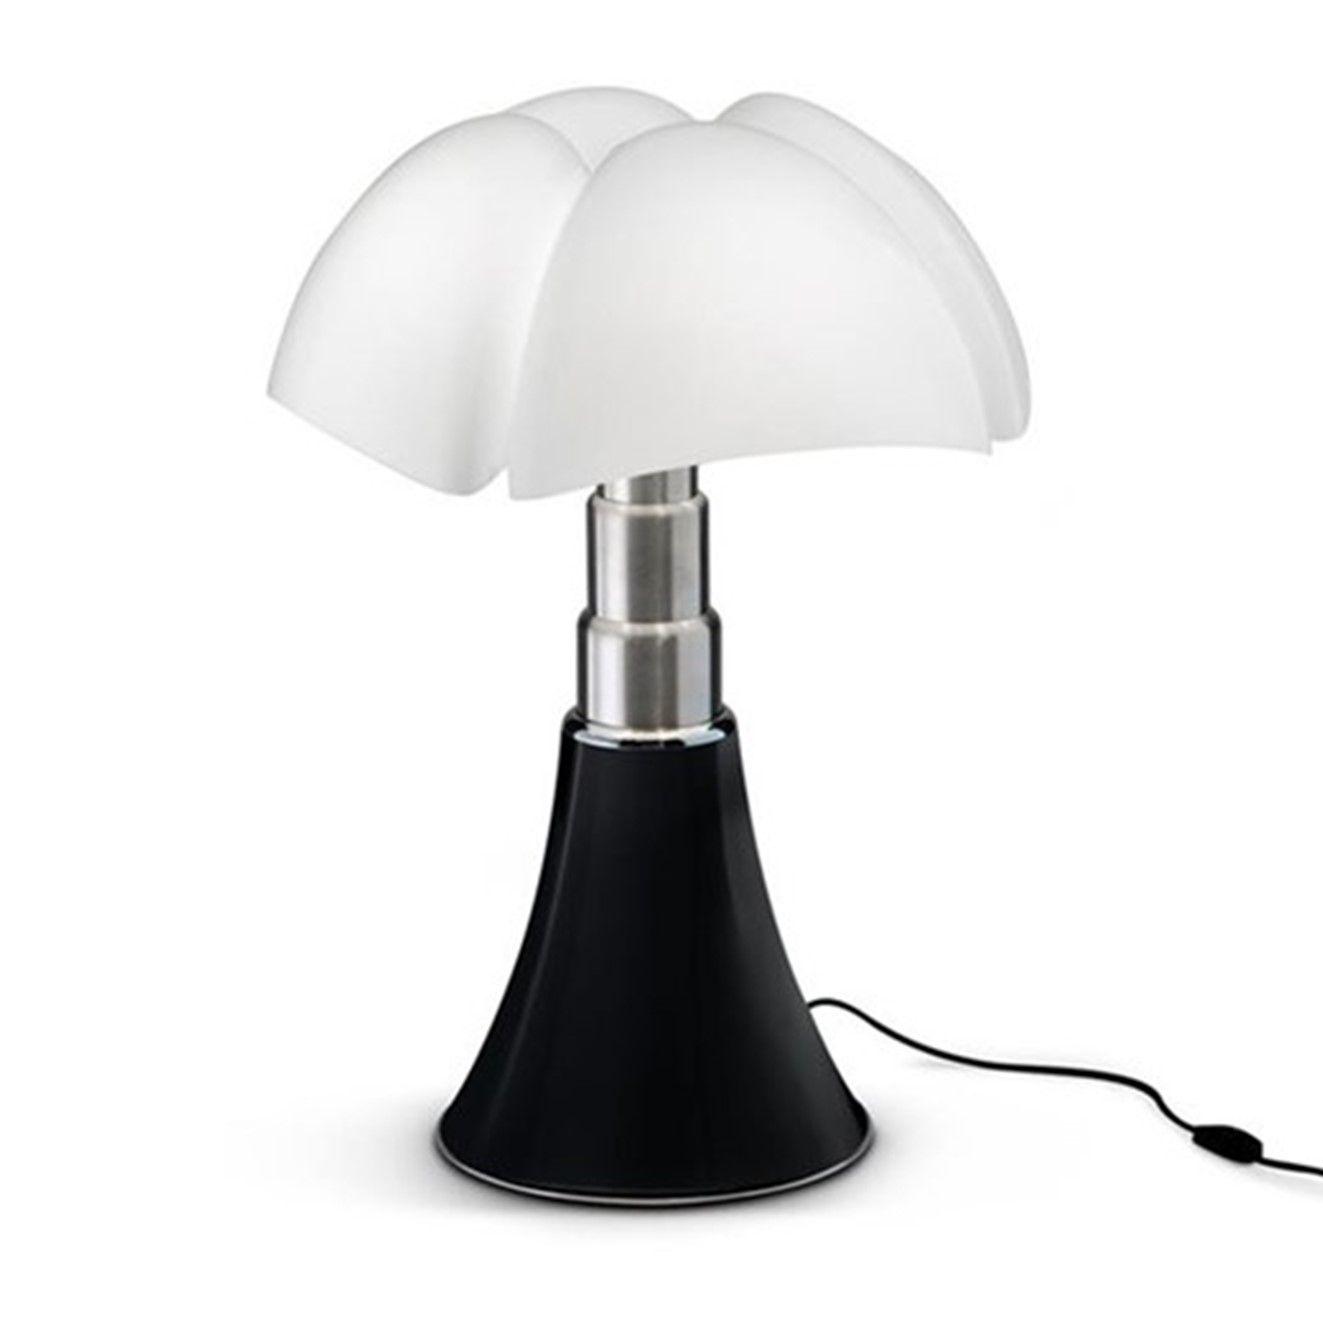 Grande Lampe Pipistrello Noir Mat Martinelli Luce H66 86cm Ref